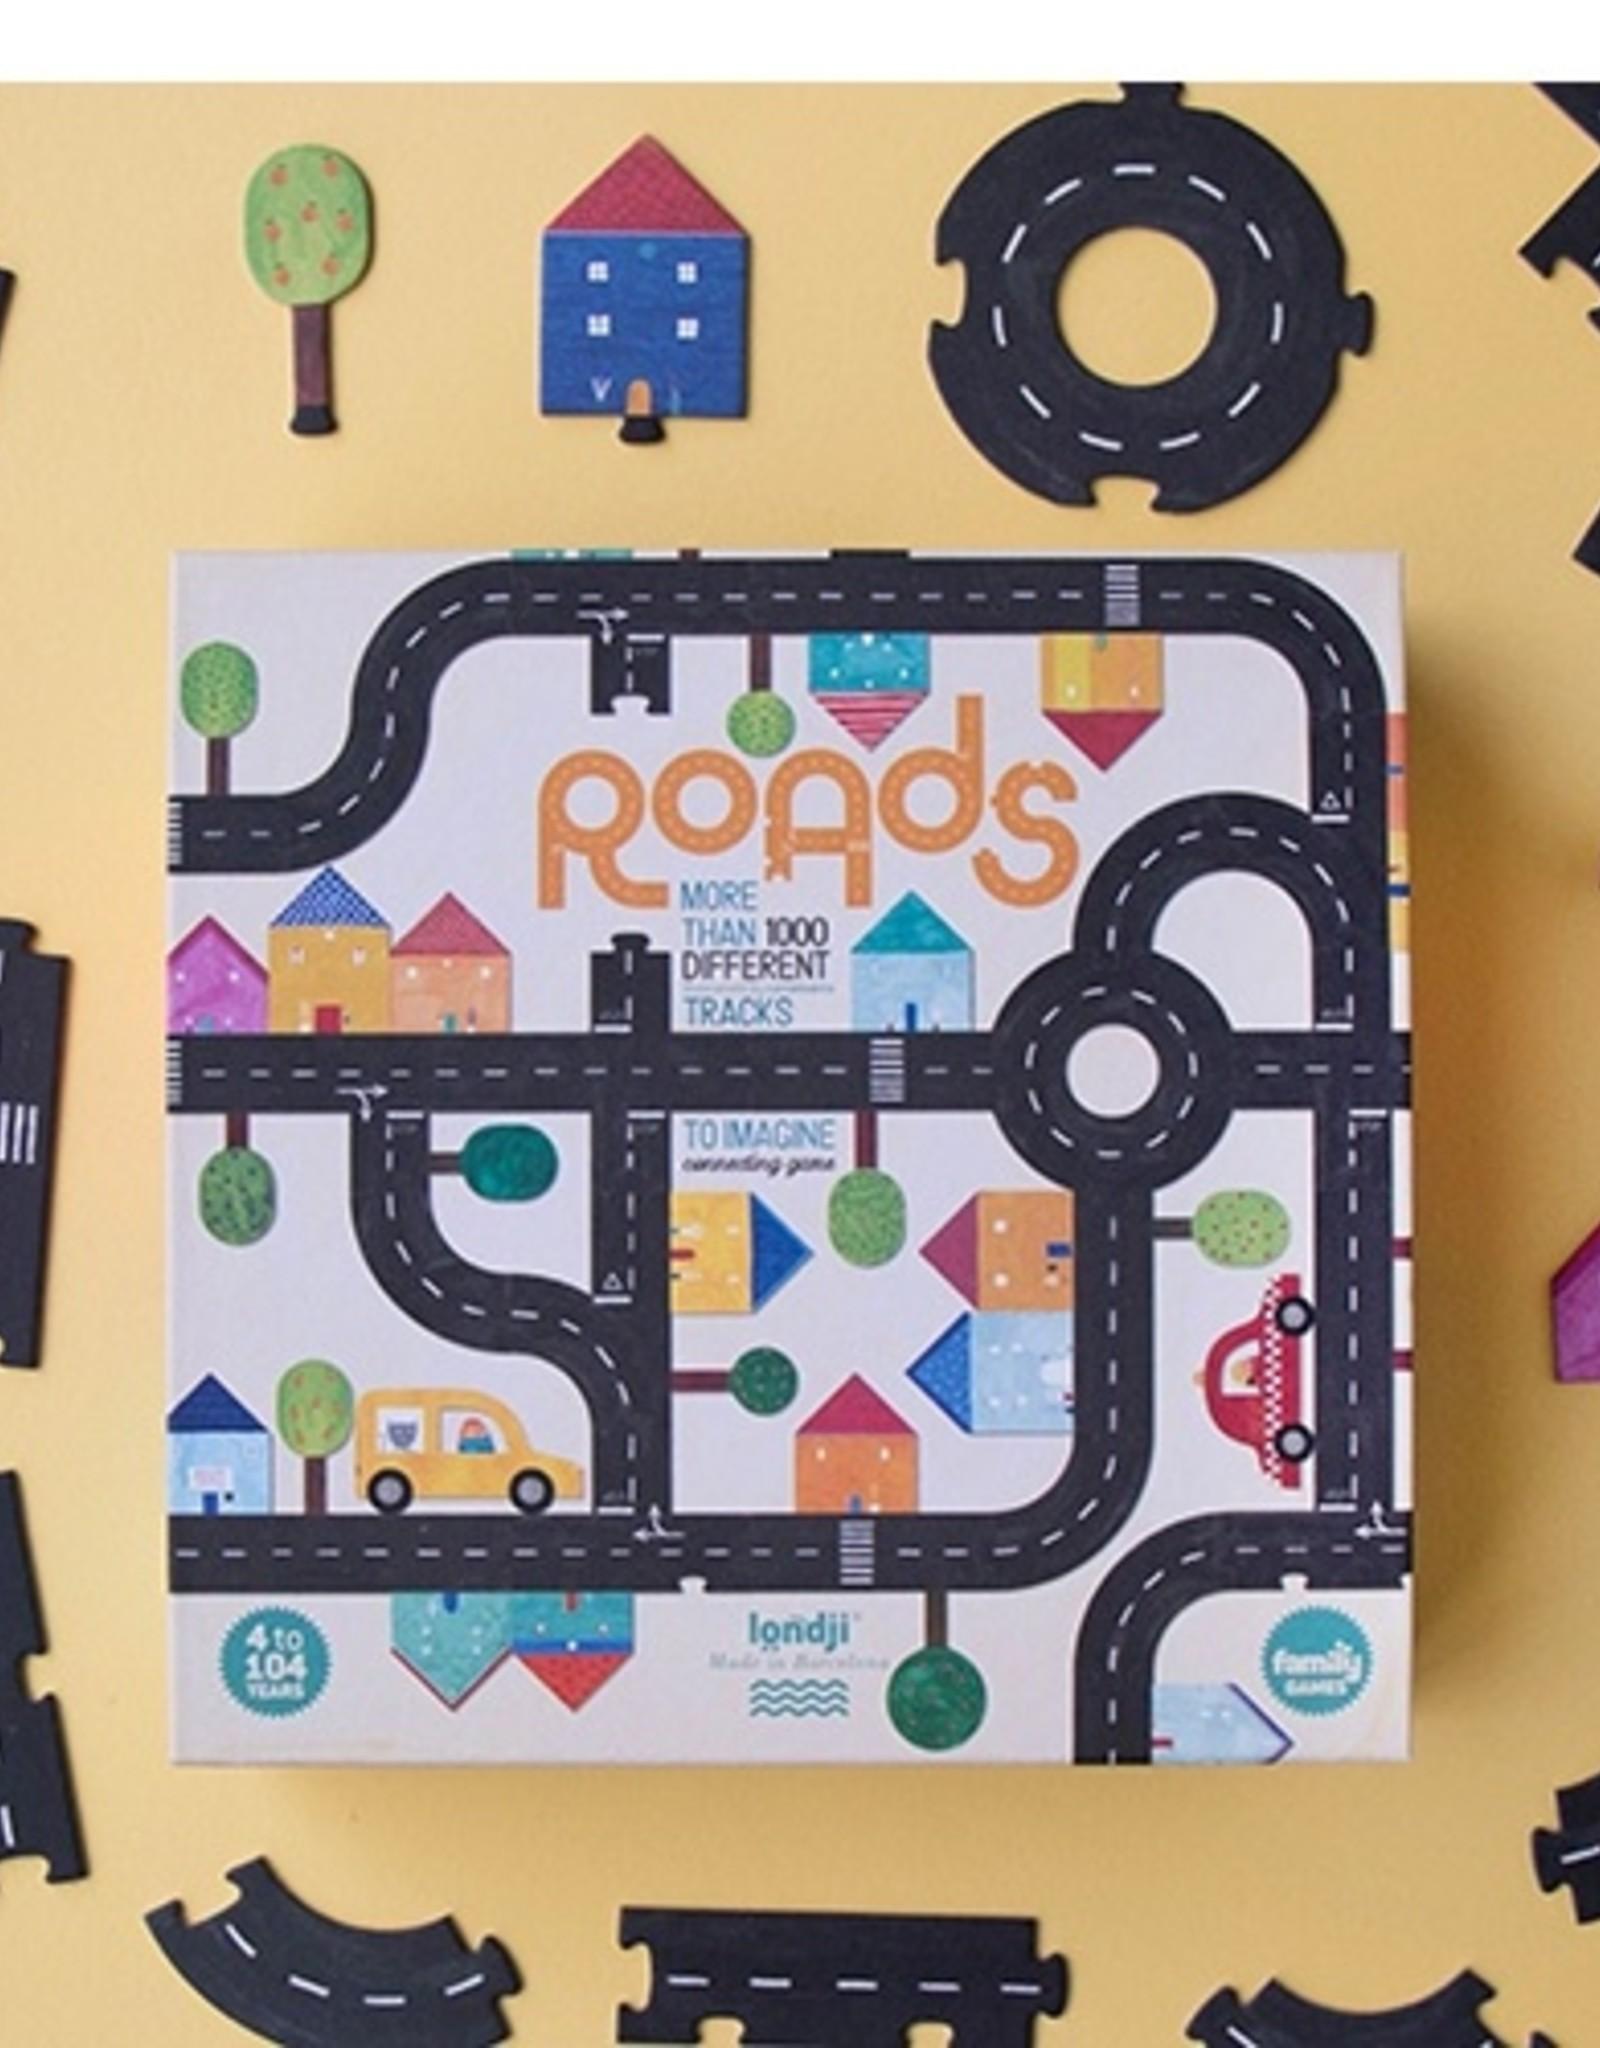 LONDJI BARCELONA Roads by Londji creative toys